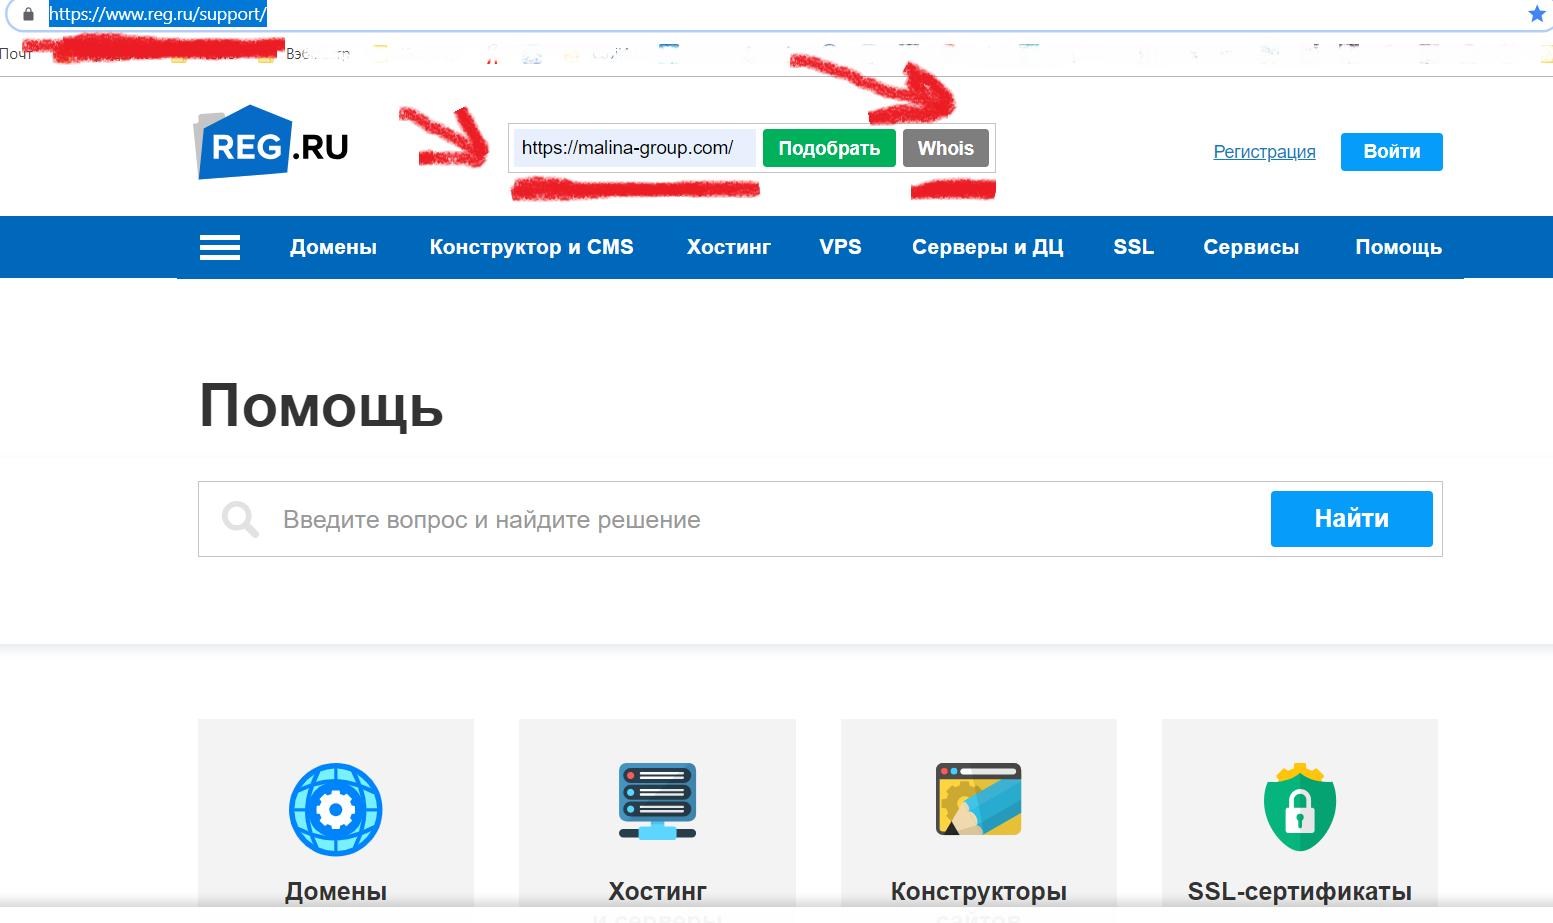 Указываем домен и жмем на кнопку Whois